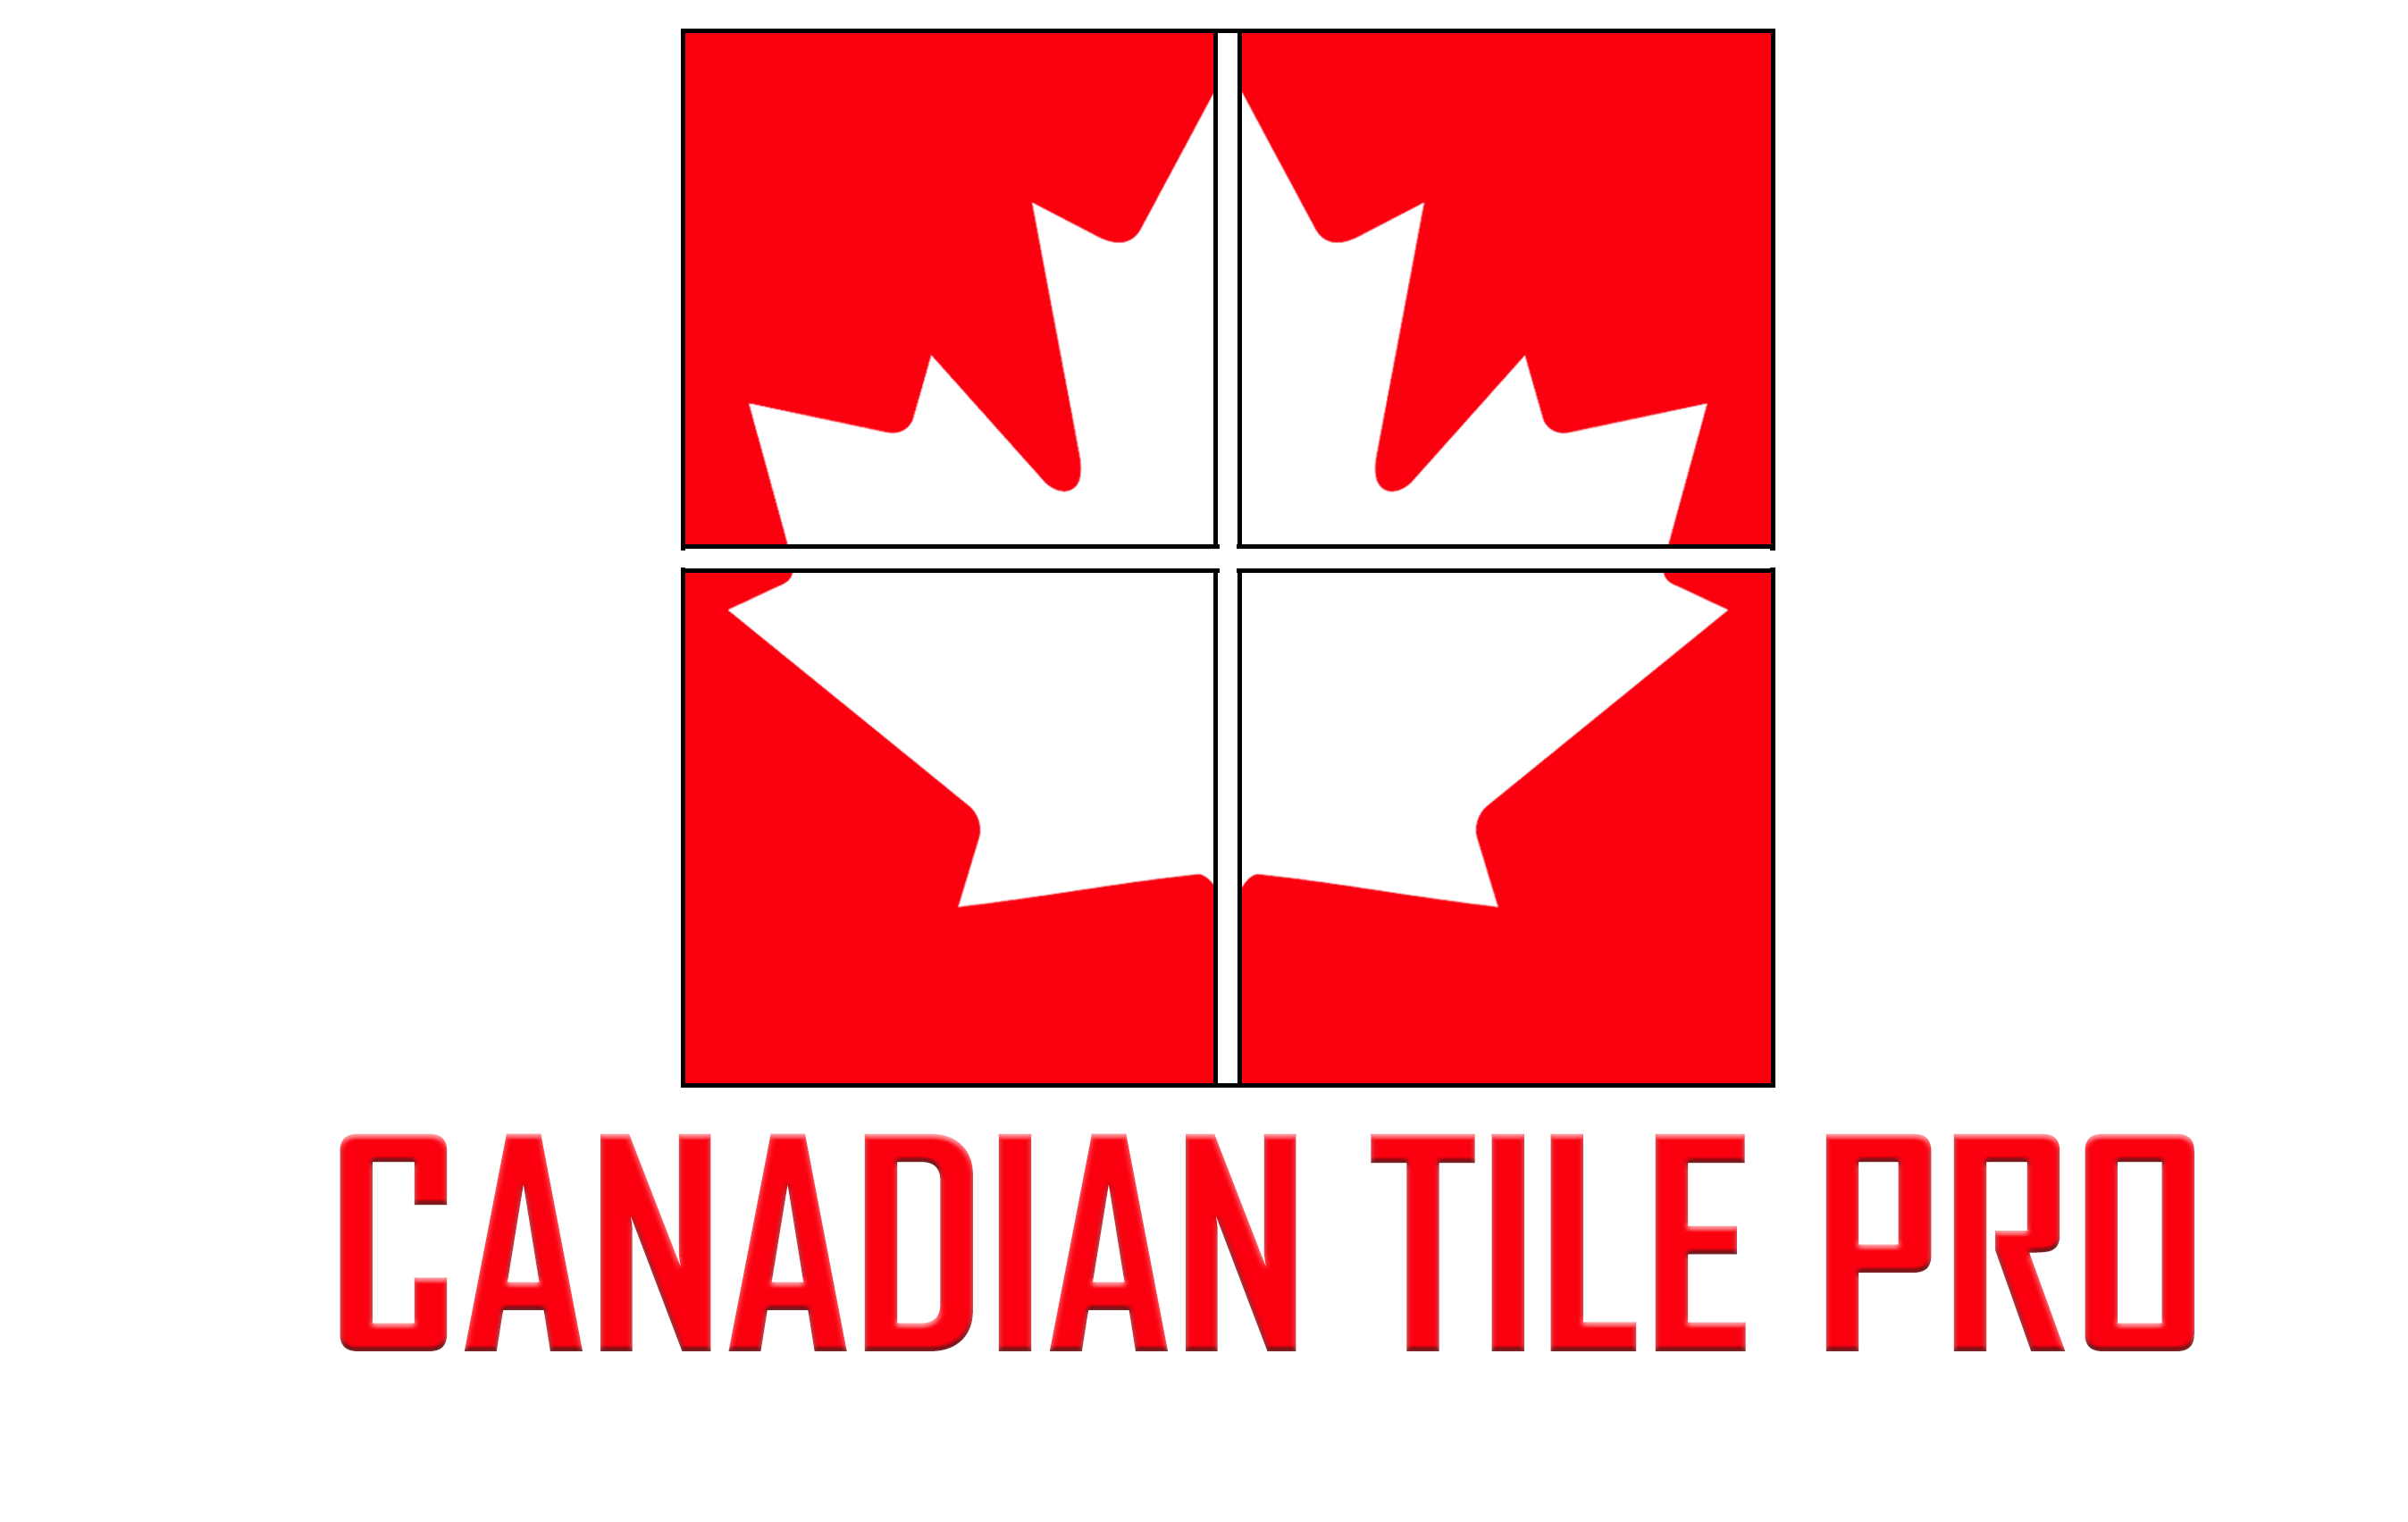 Canadian Tile Pro